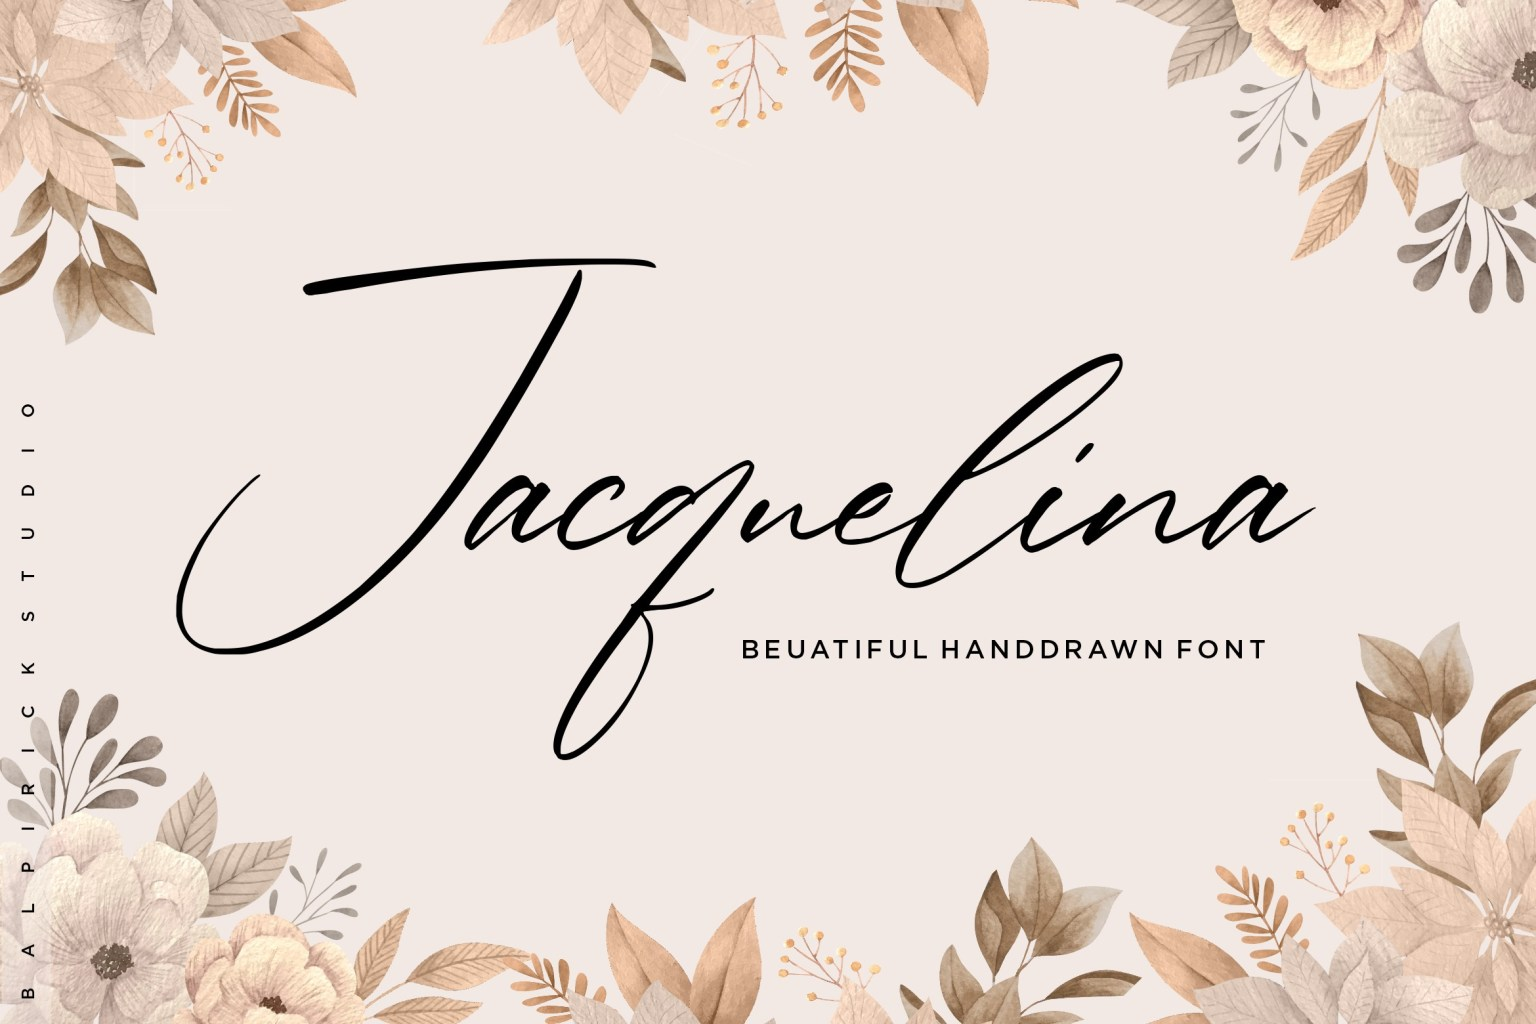 Jacquelina Handdrawn Font